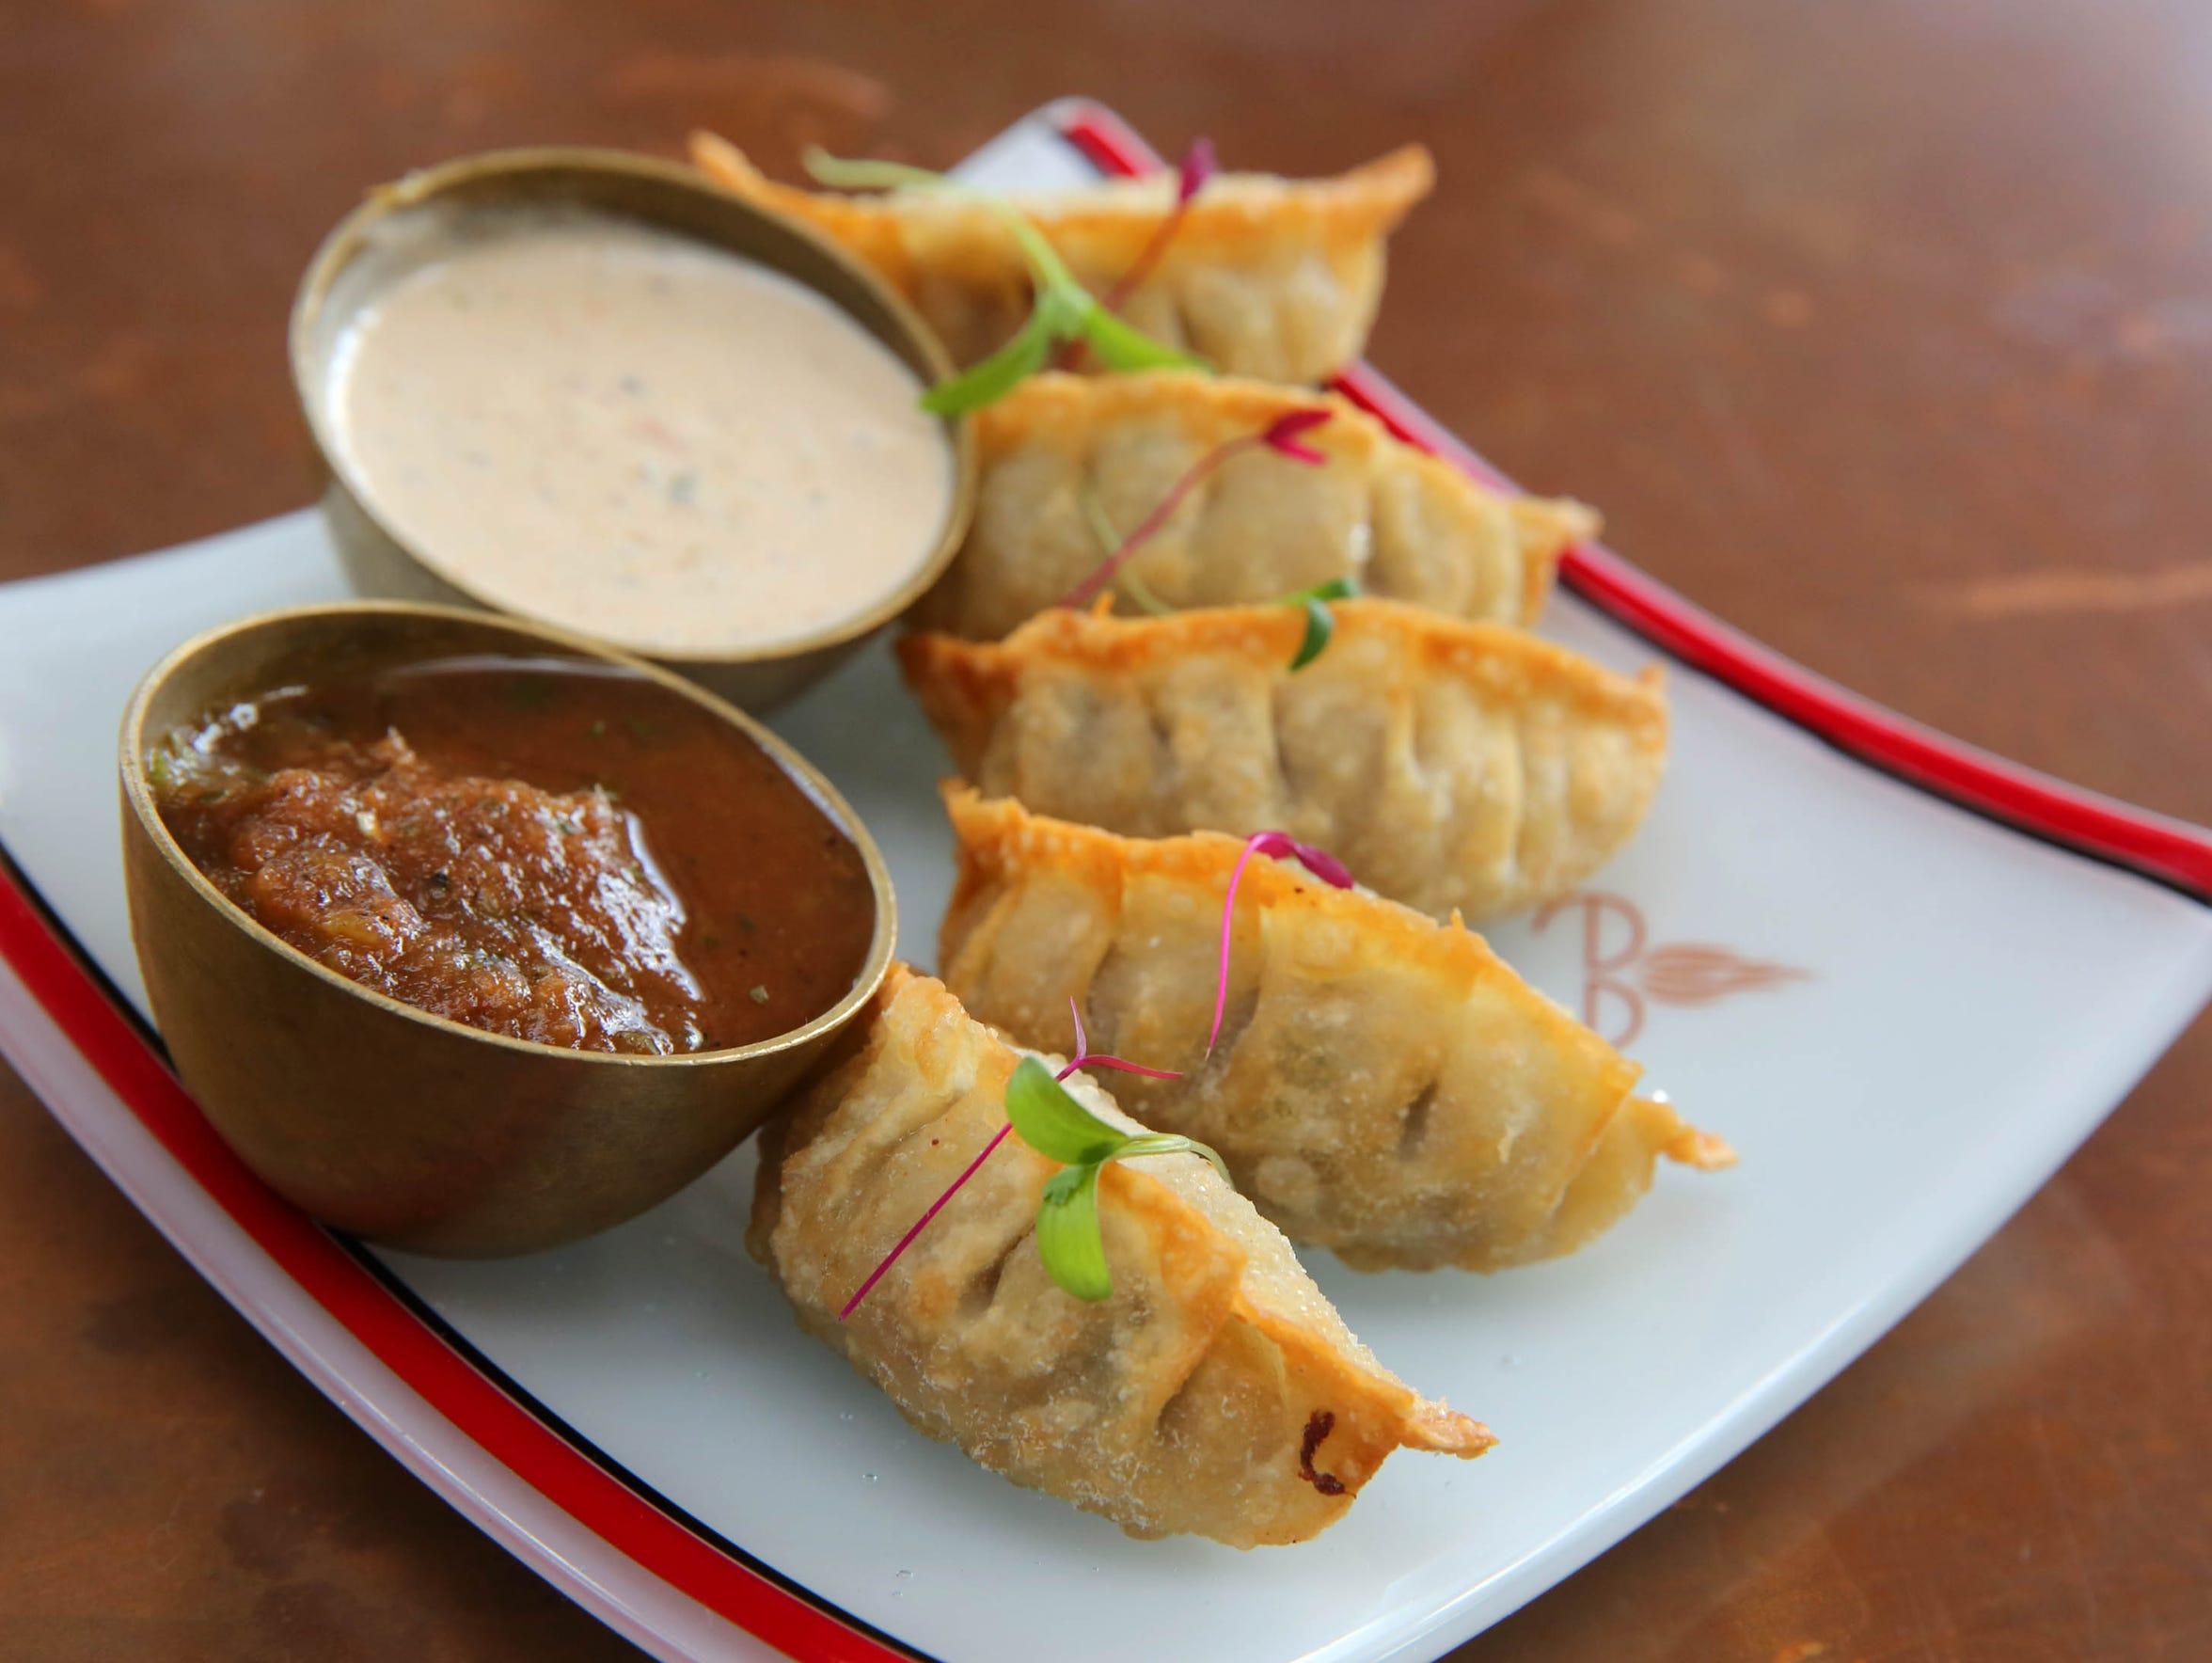 Momo are among the menu items at the Cheel, a Nepali